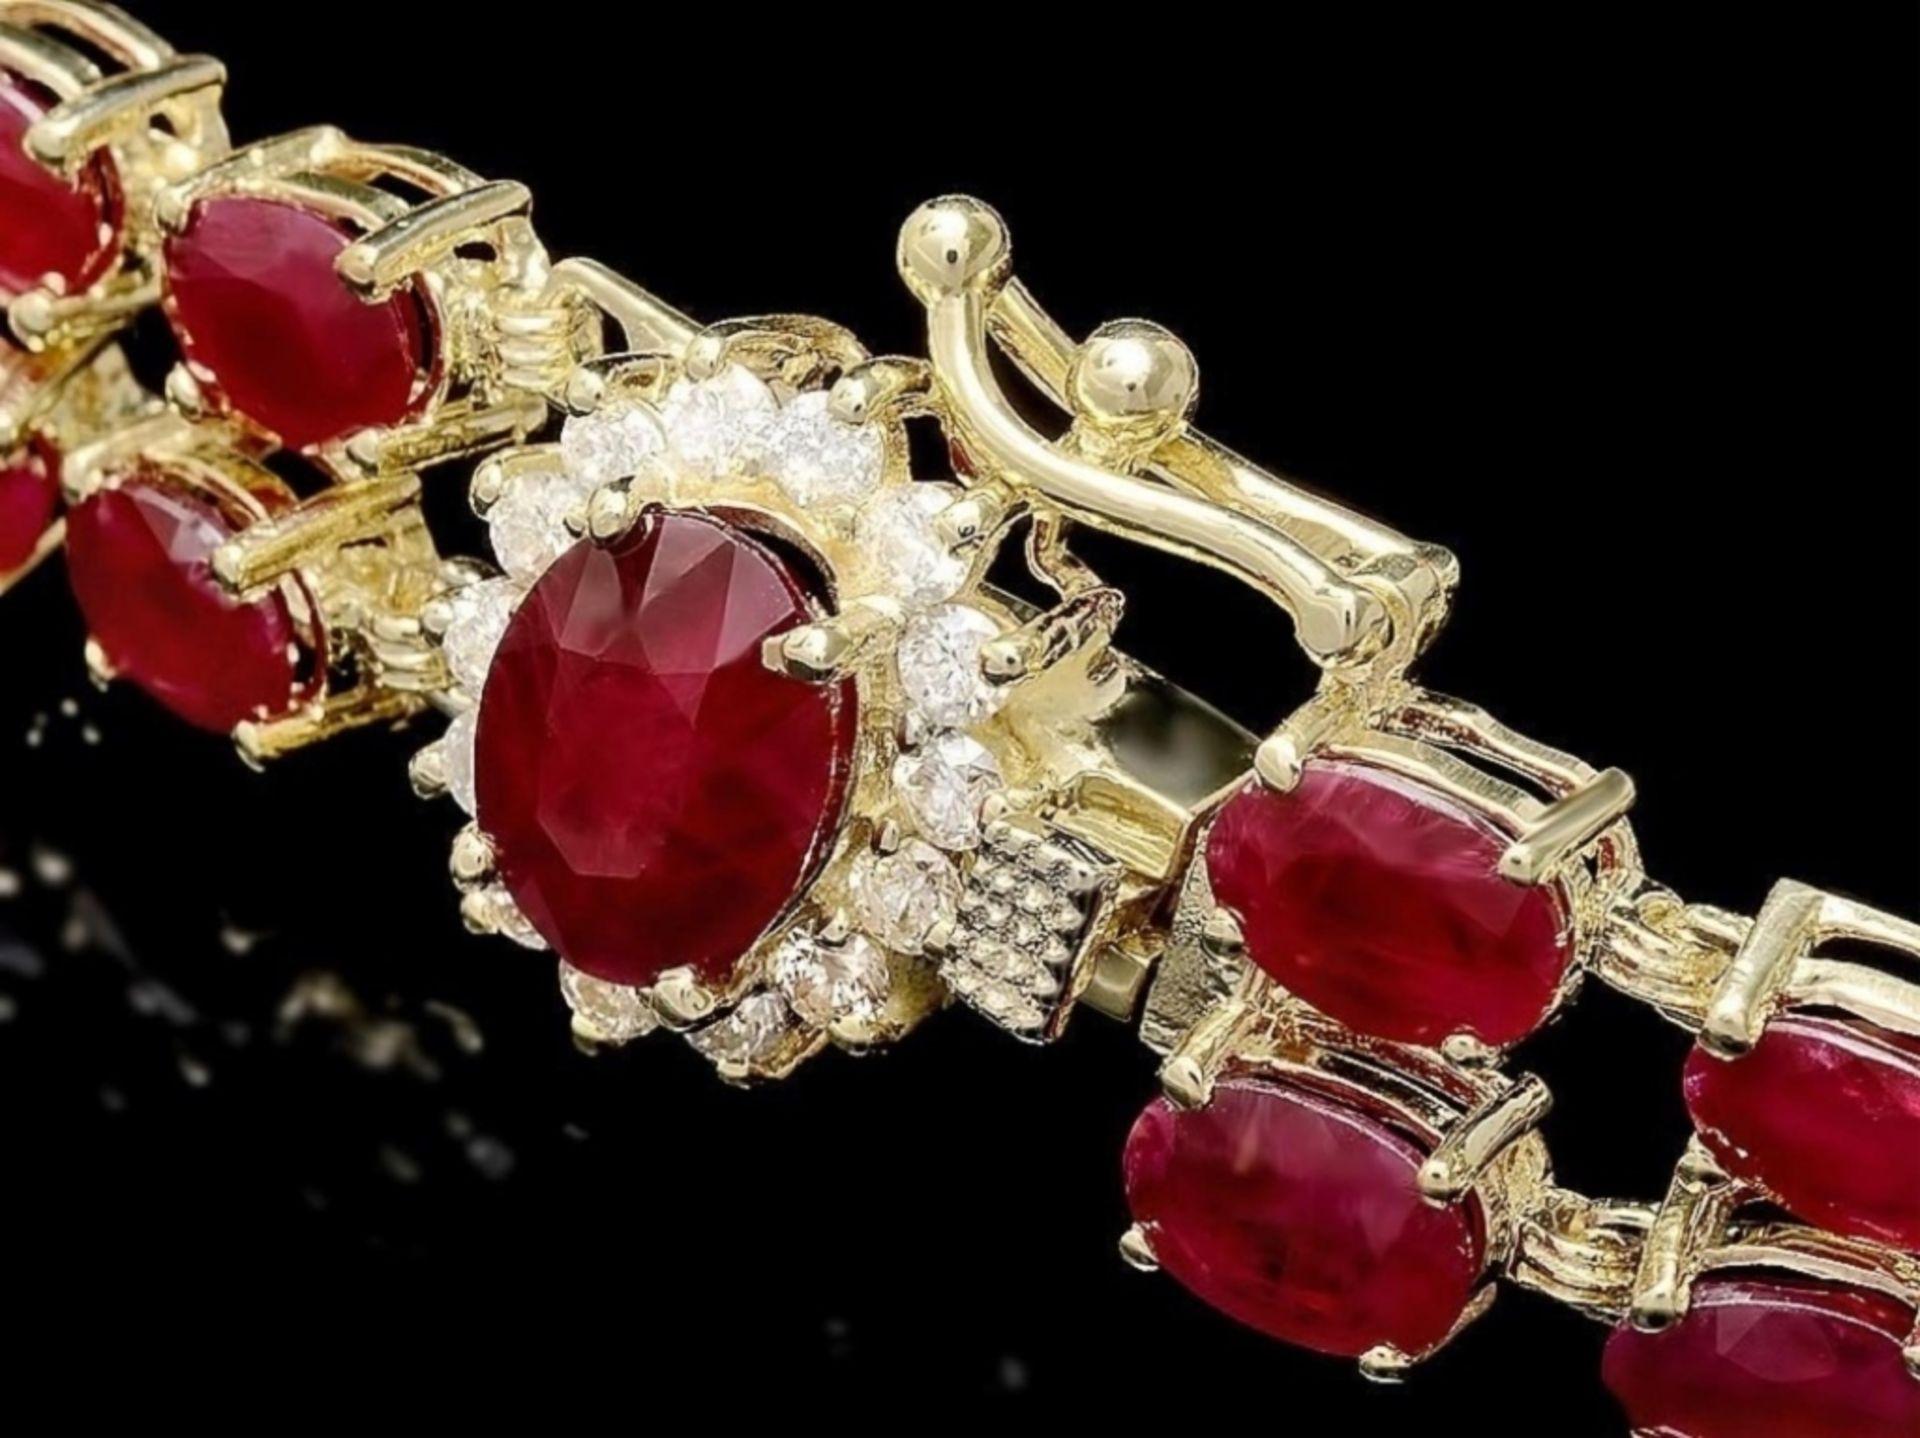 `14k Gold 20.00ct Ruby & 0.50ct Diamond Bracelet - Image 2 of 3